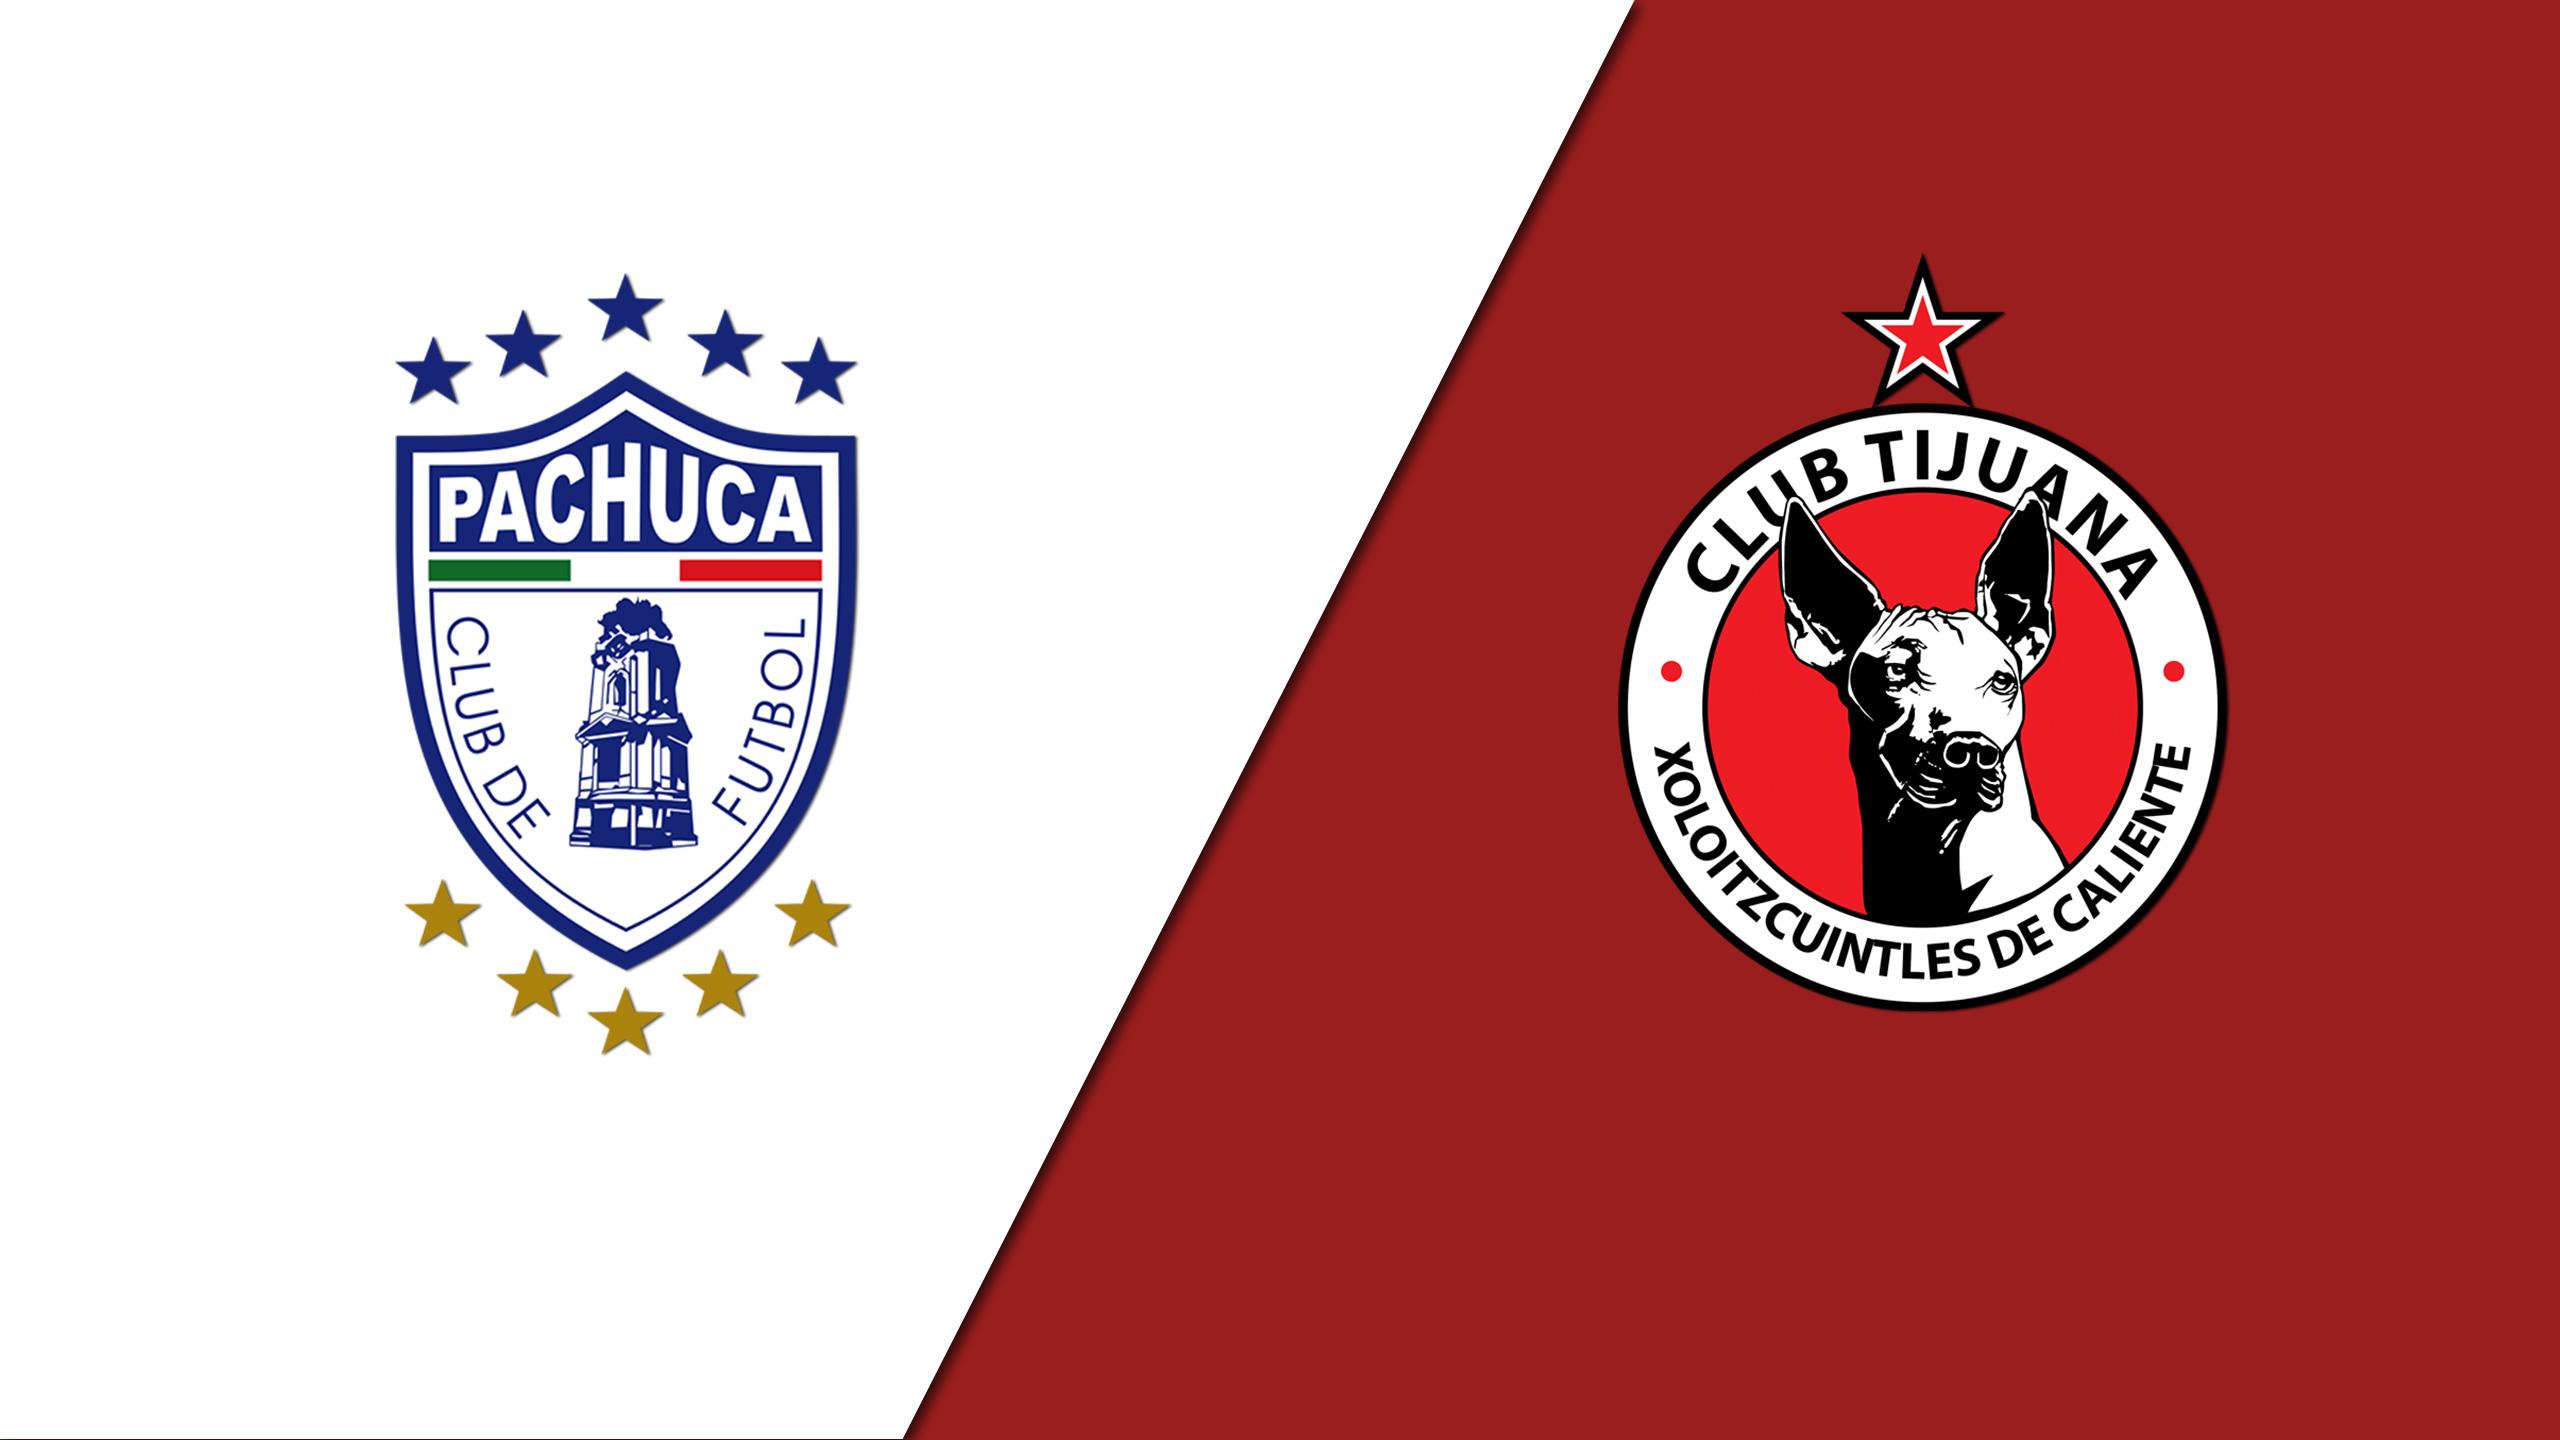 Tuzos del Pachuca vs. Xolos de Tijuana (Jornada 3)